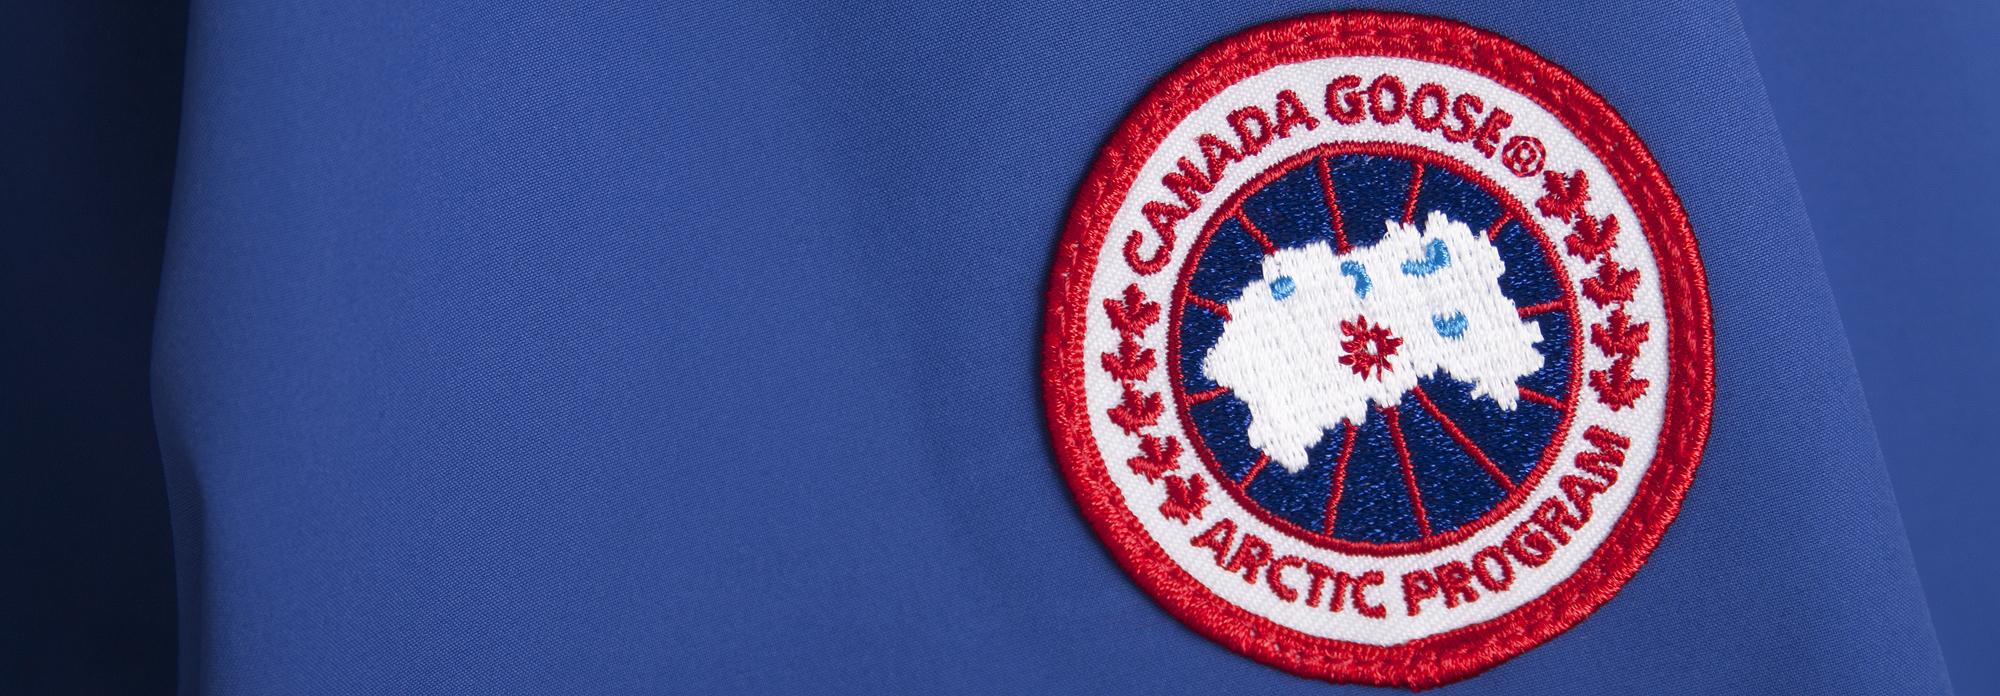 Canada Goose SS15